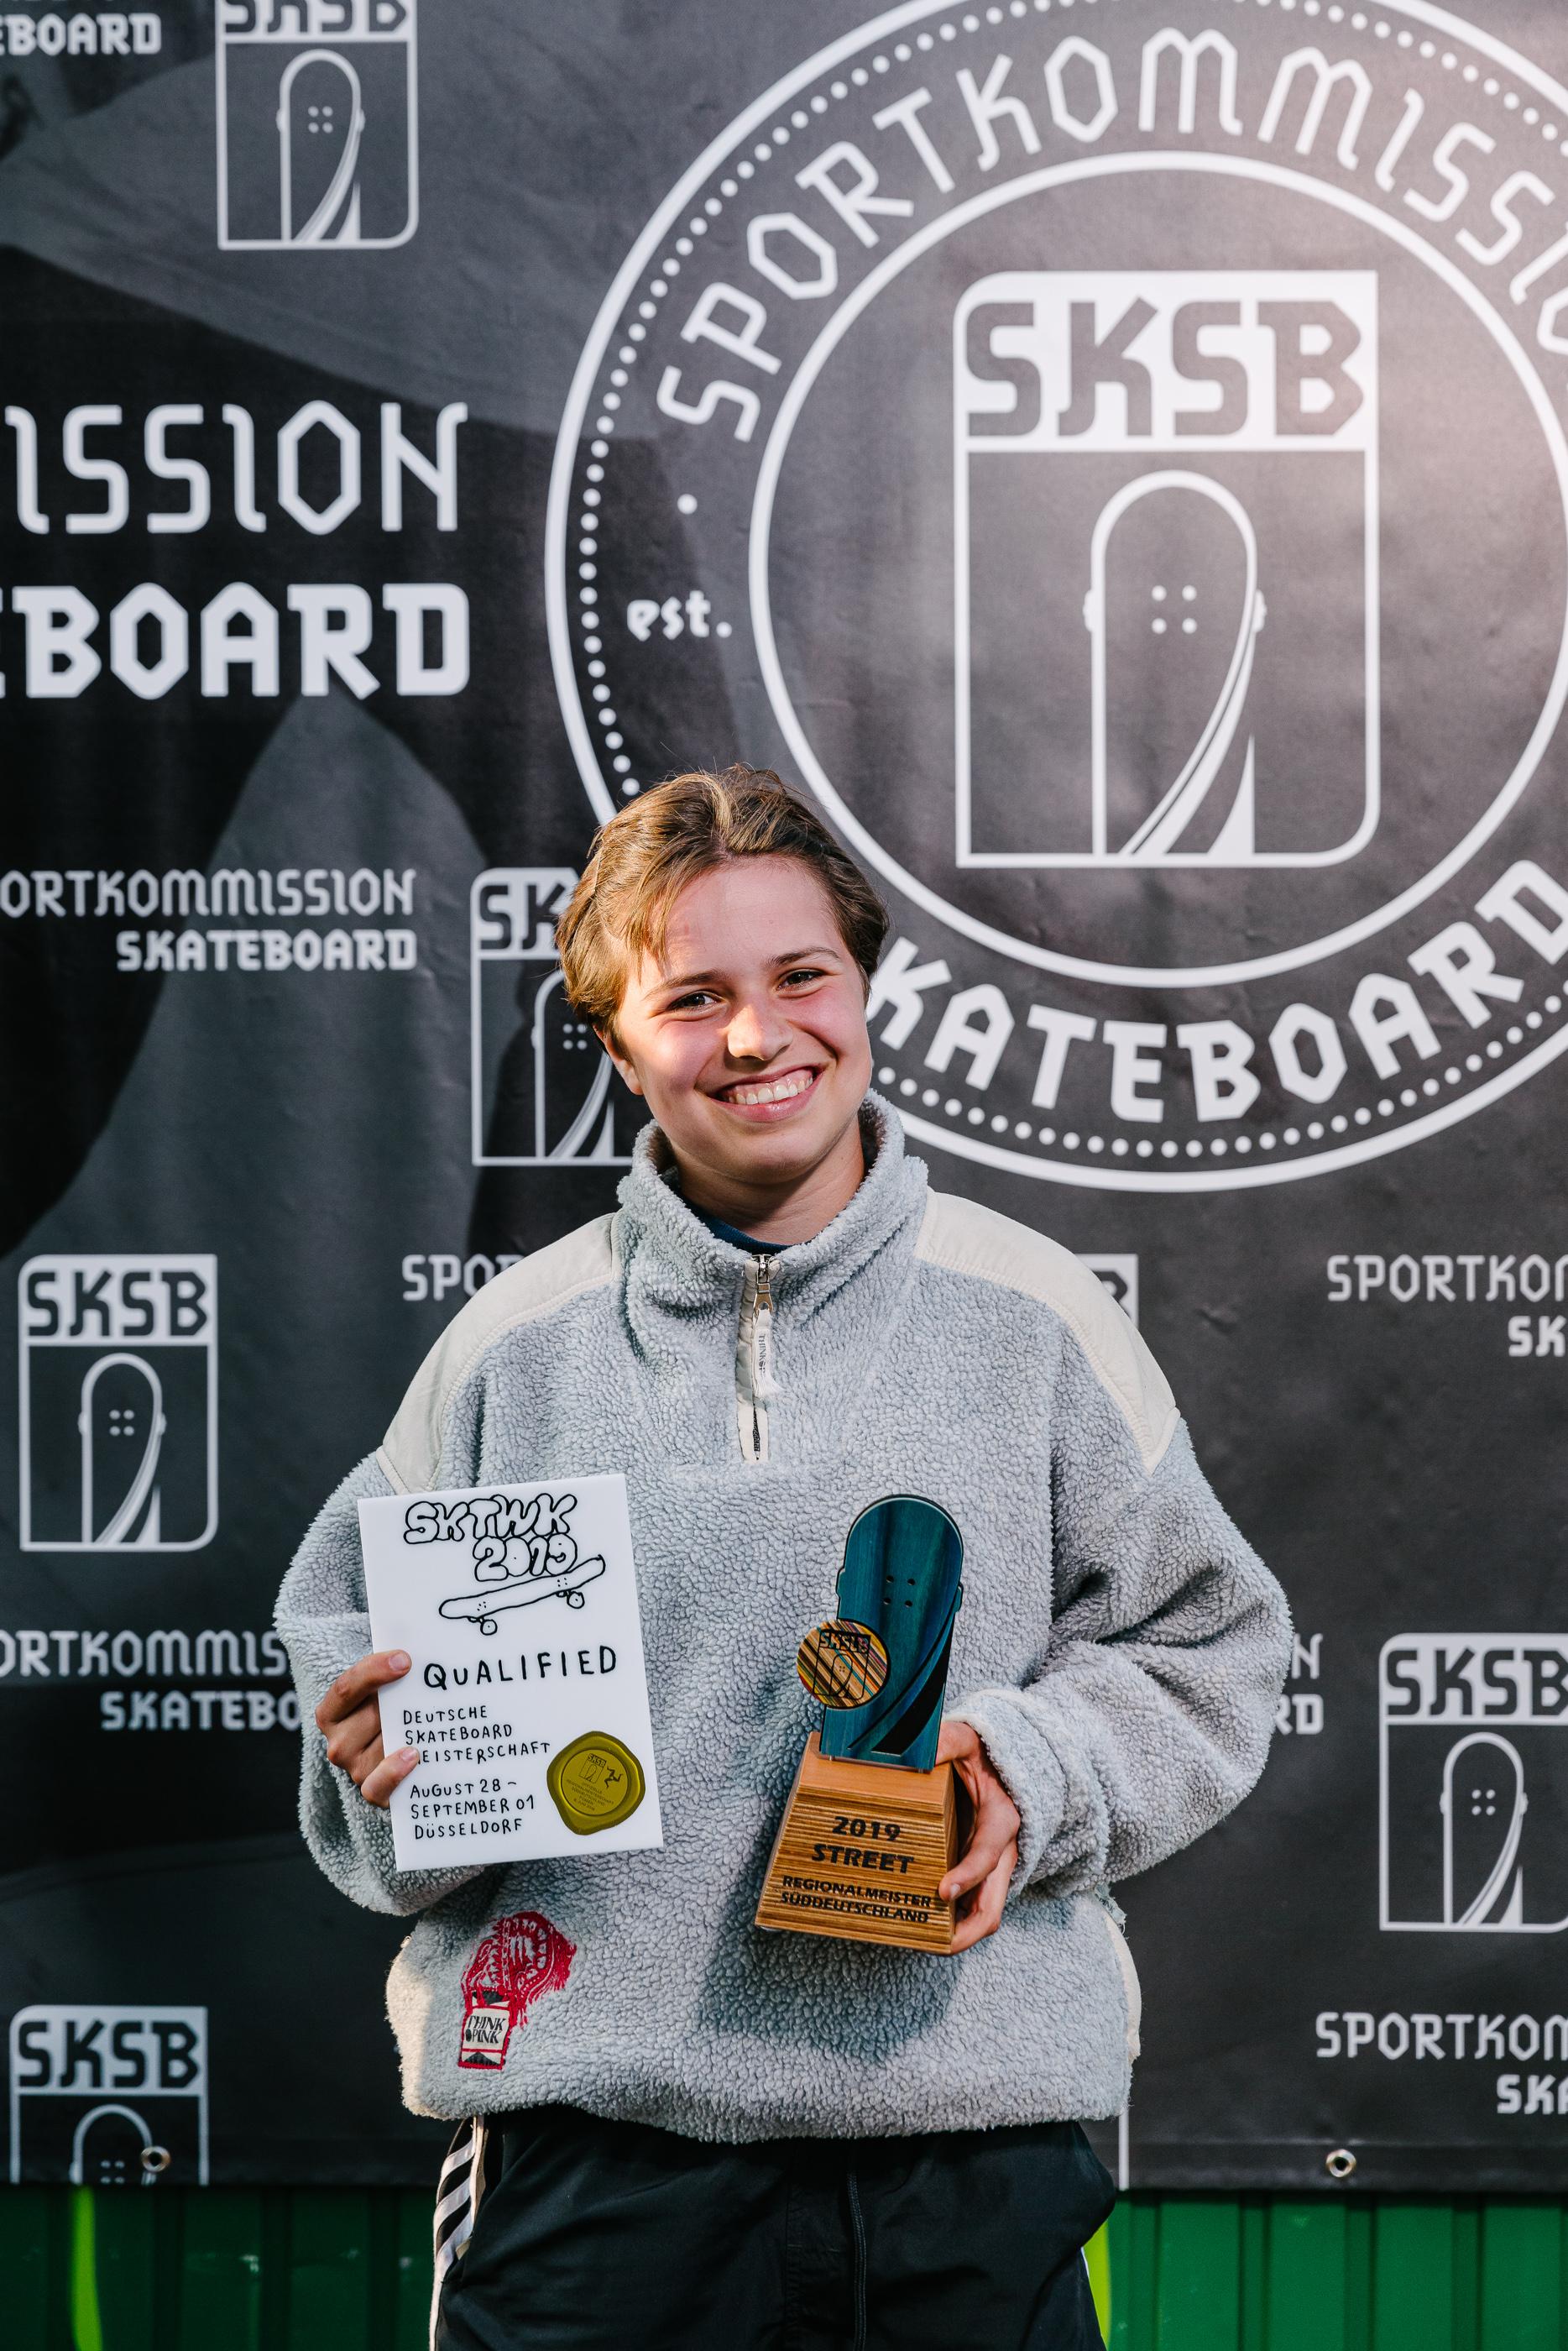 1. Platz und somit Offizielle Süddeutsche Meisterin: Rosa Altmann (Stuttgarter Skateboard Verein e. V.) Foto: simontoplak.com